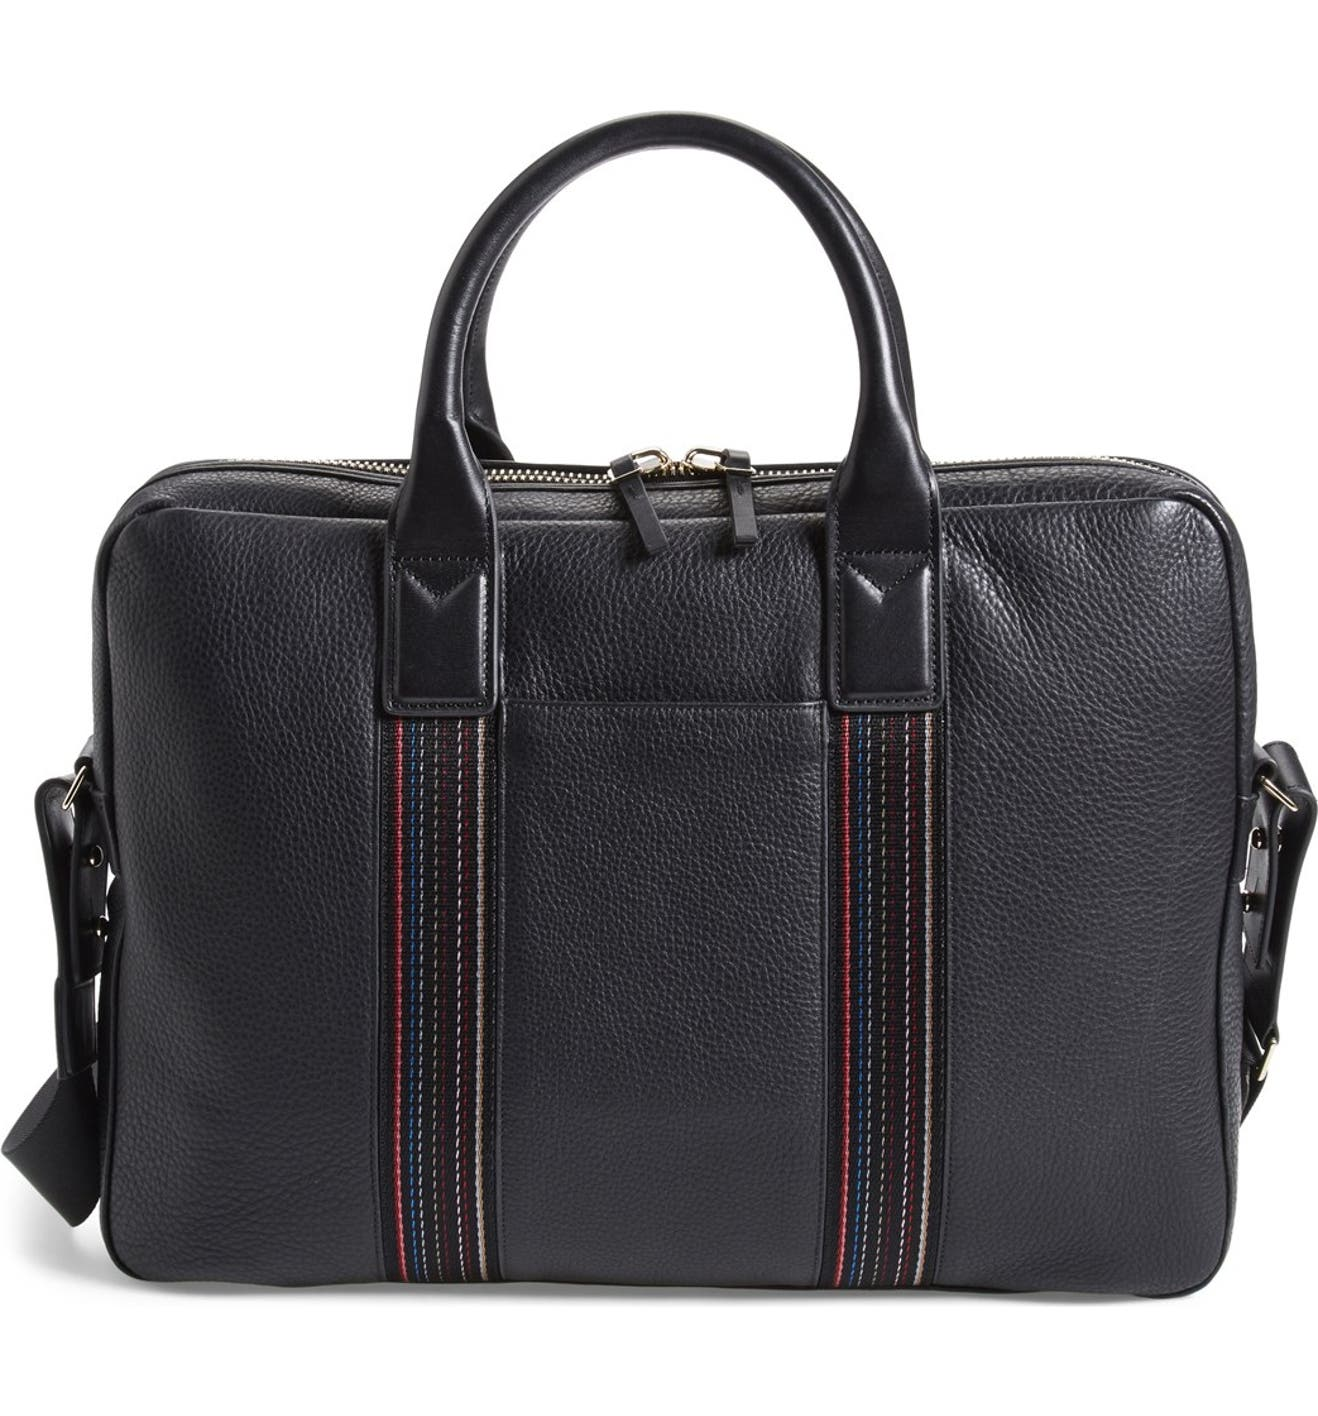 Paul Smith  City Web  Leather Briefcase  55b305b9f32c6